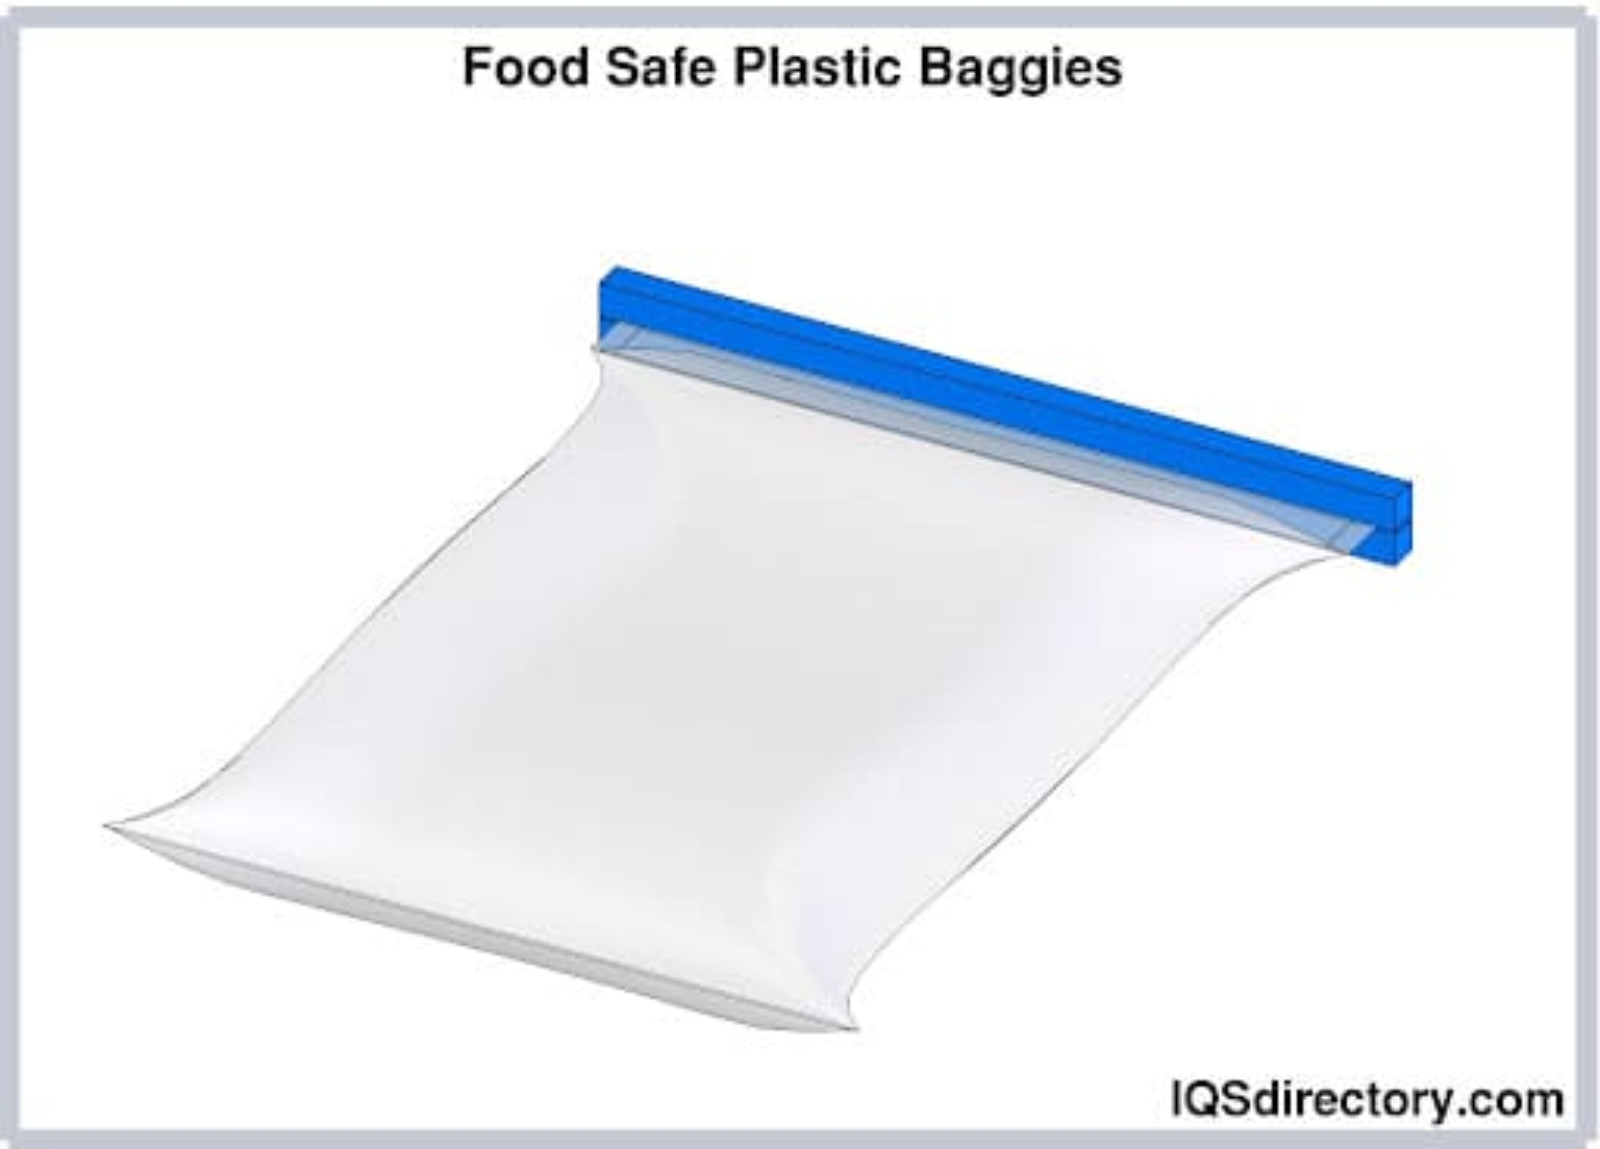 Food Safe Plastic Baggies